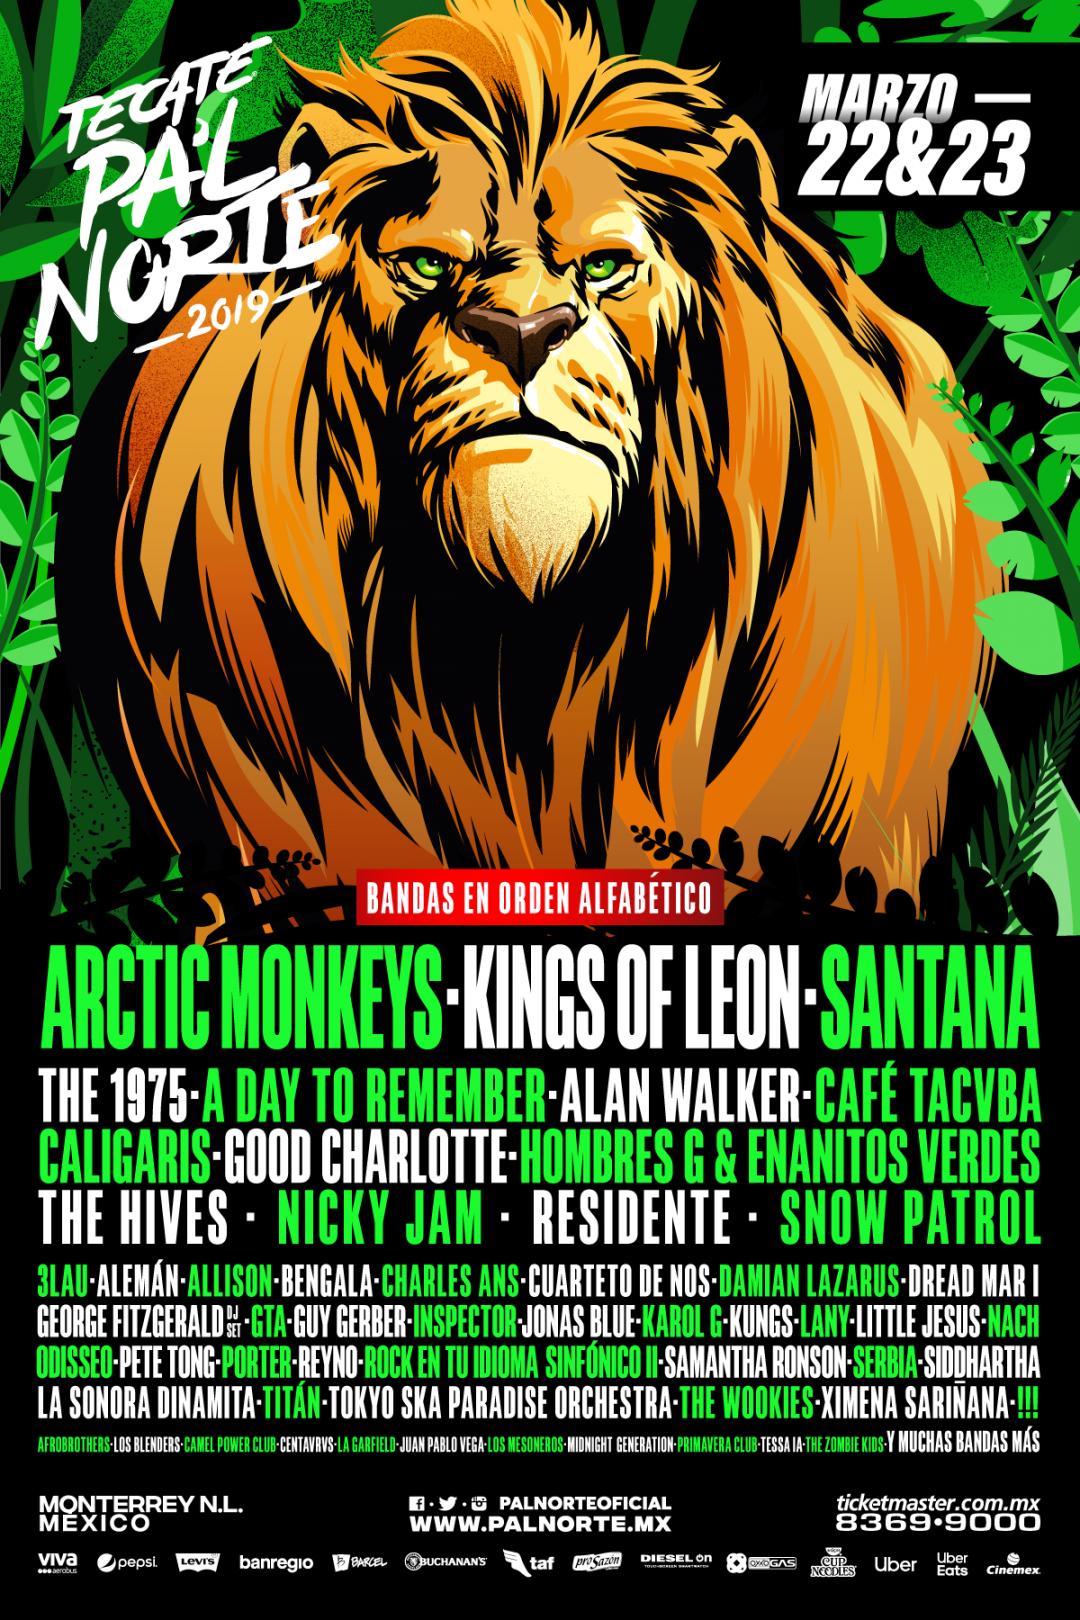 A Day To Remember, 1975, Good Charlotte, Arctic Monkeys, en Monterrey en el Tecate Pal Norte